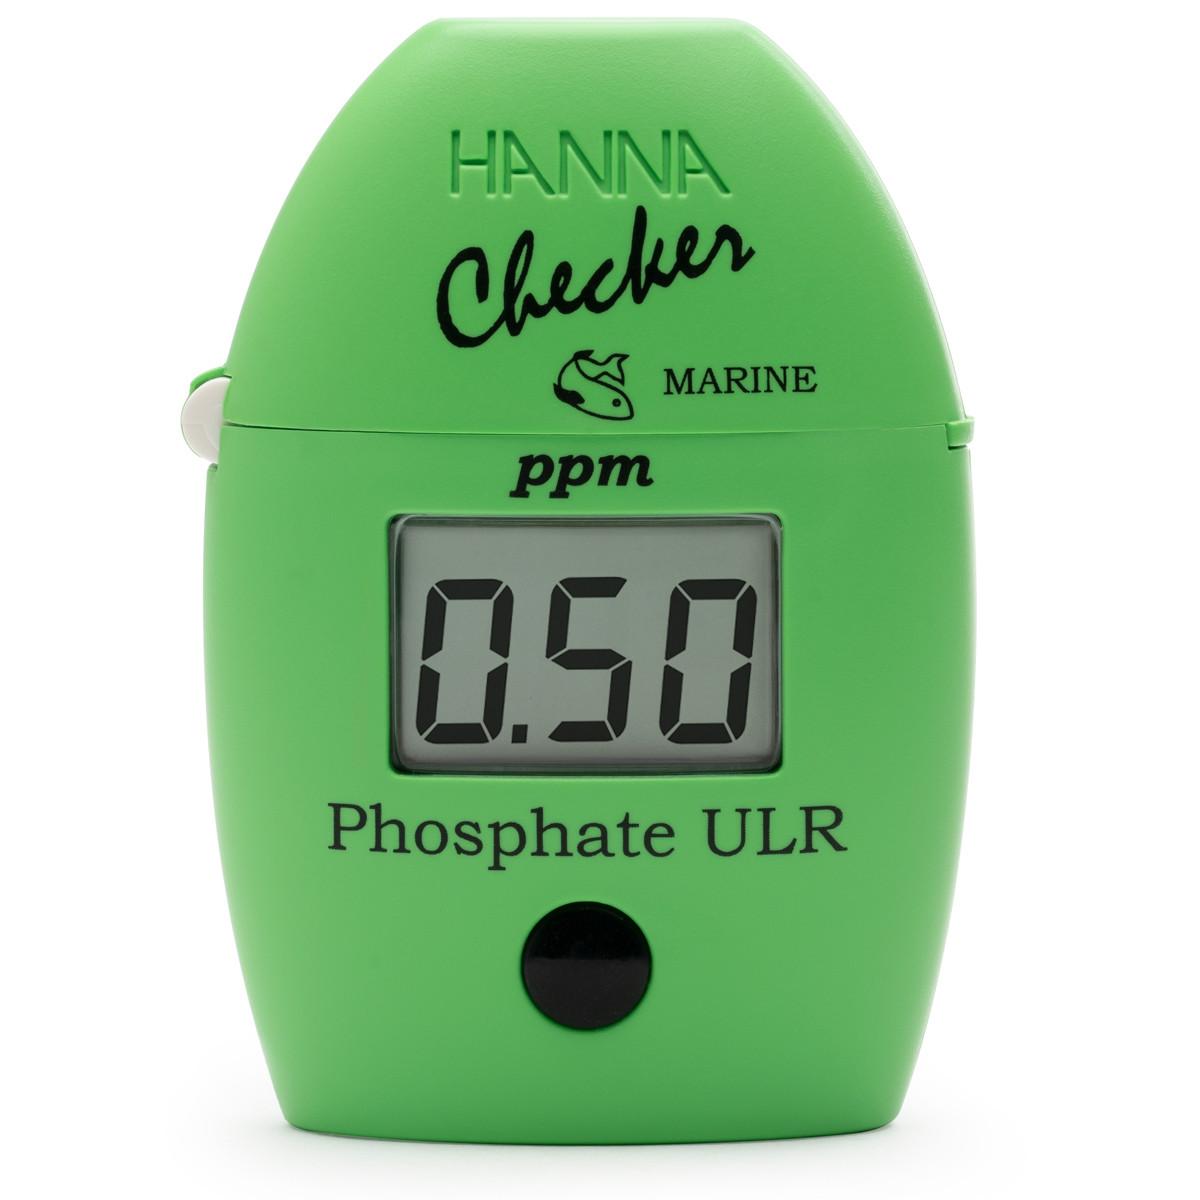 Marine Phosphate Ultra Low Range Colorimeter - Checker® HC